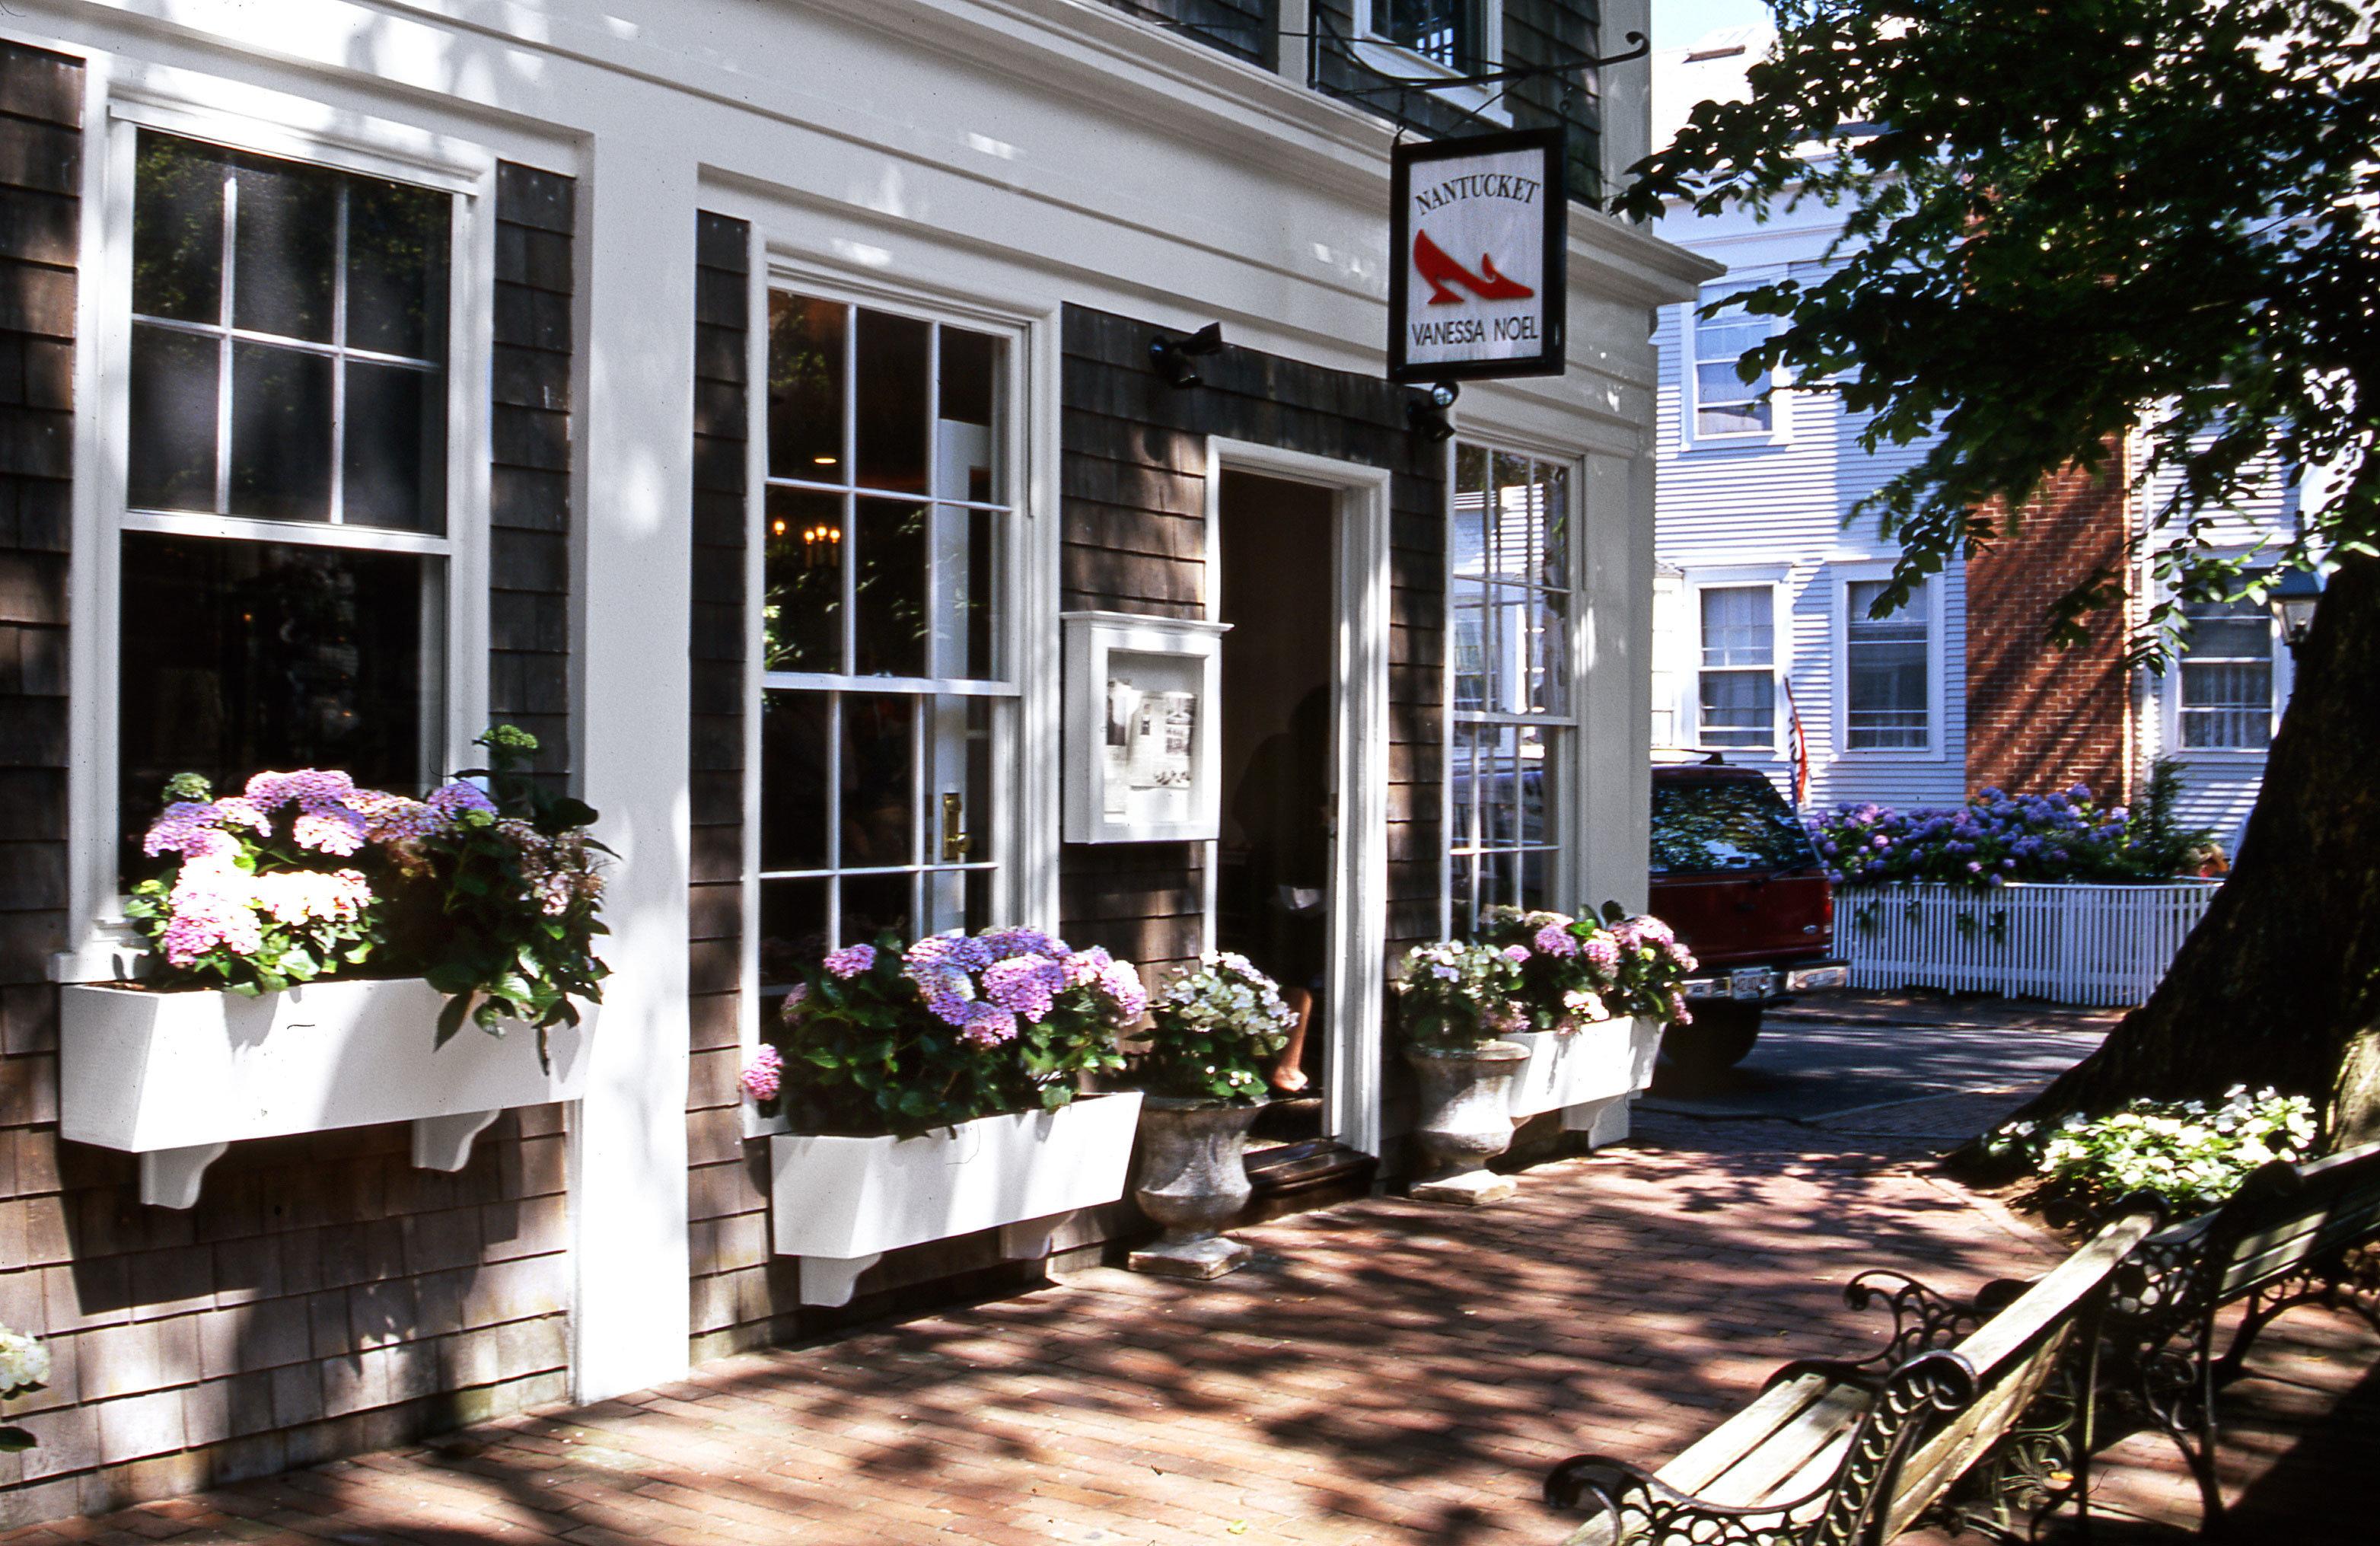 Boutique Budget Exterior Historic building home Courtyard porch backyard outdoor structure flower